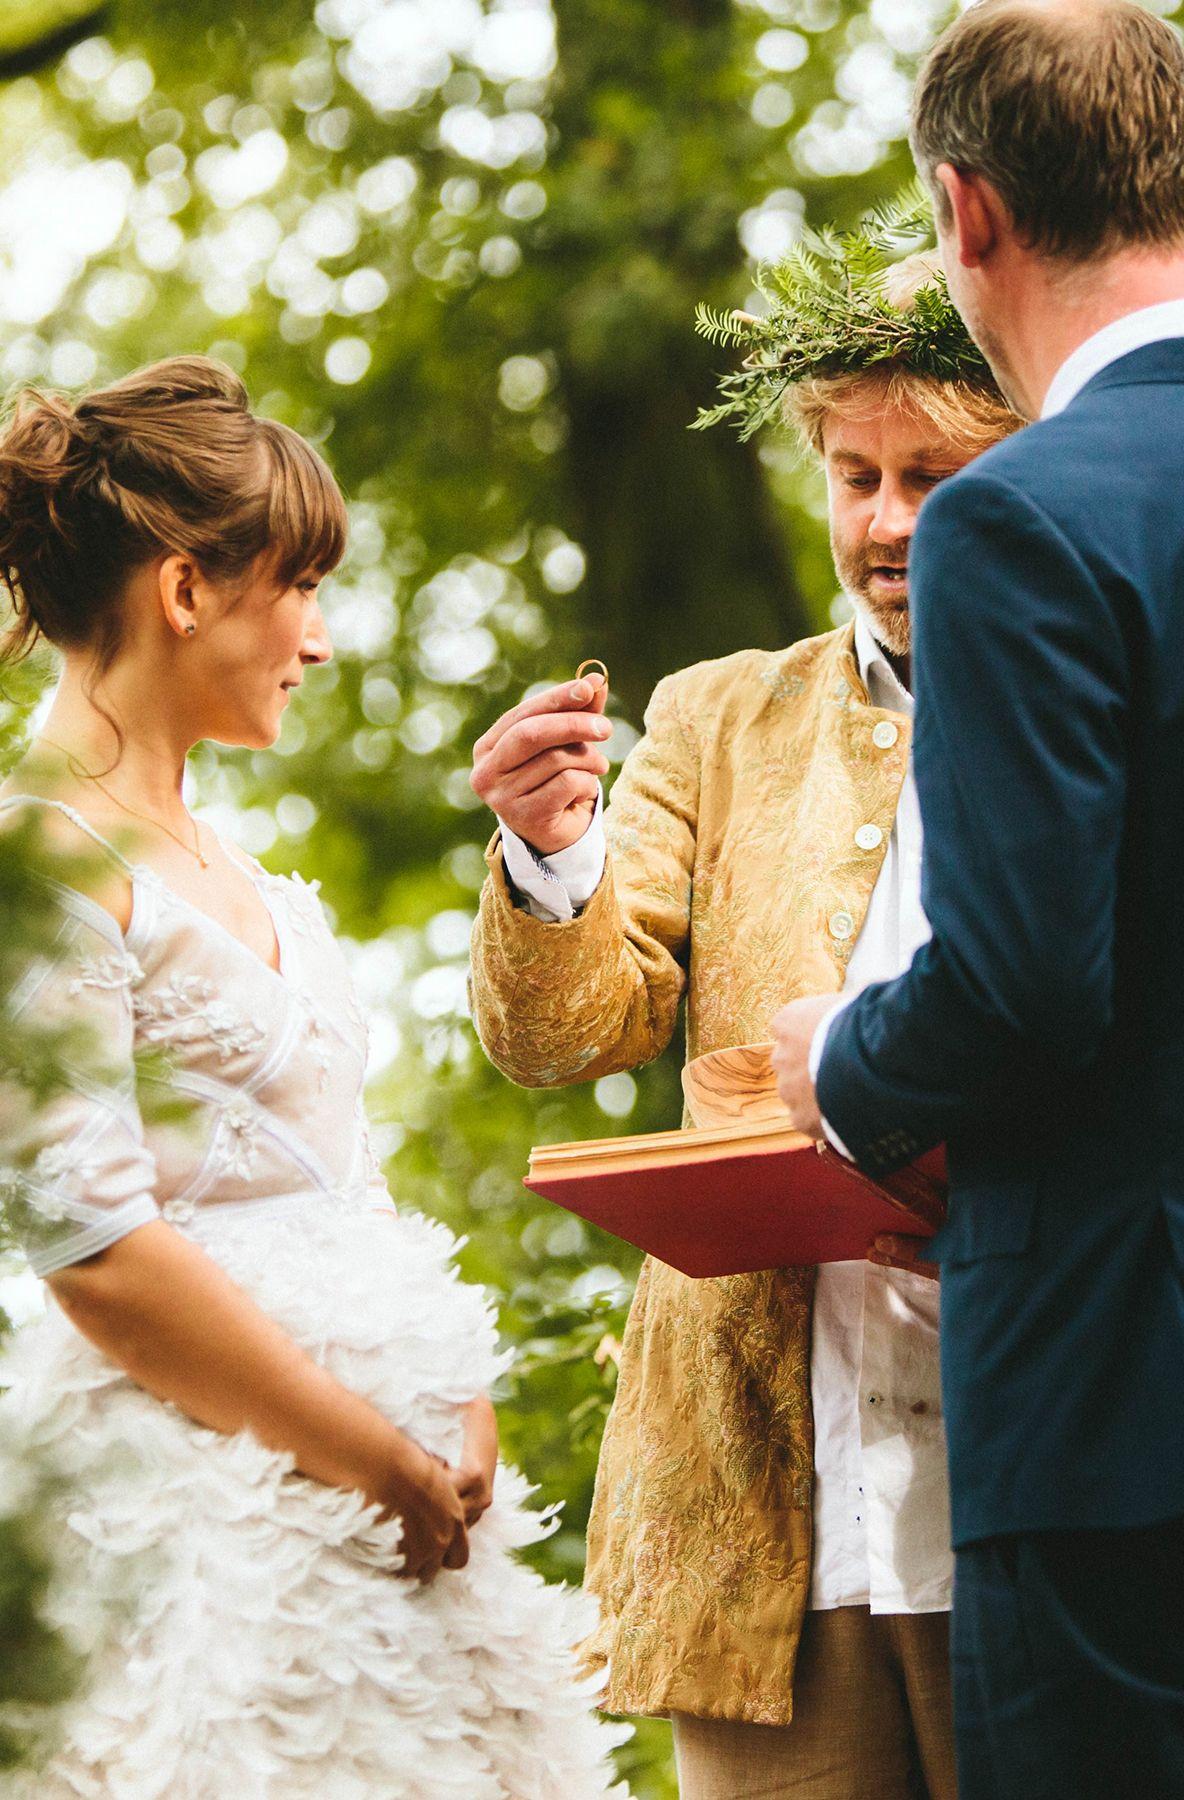 craig williams photography london wedding photographer craig williams 1